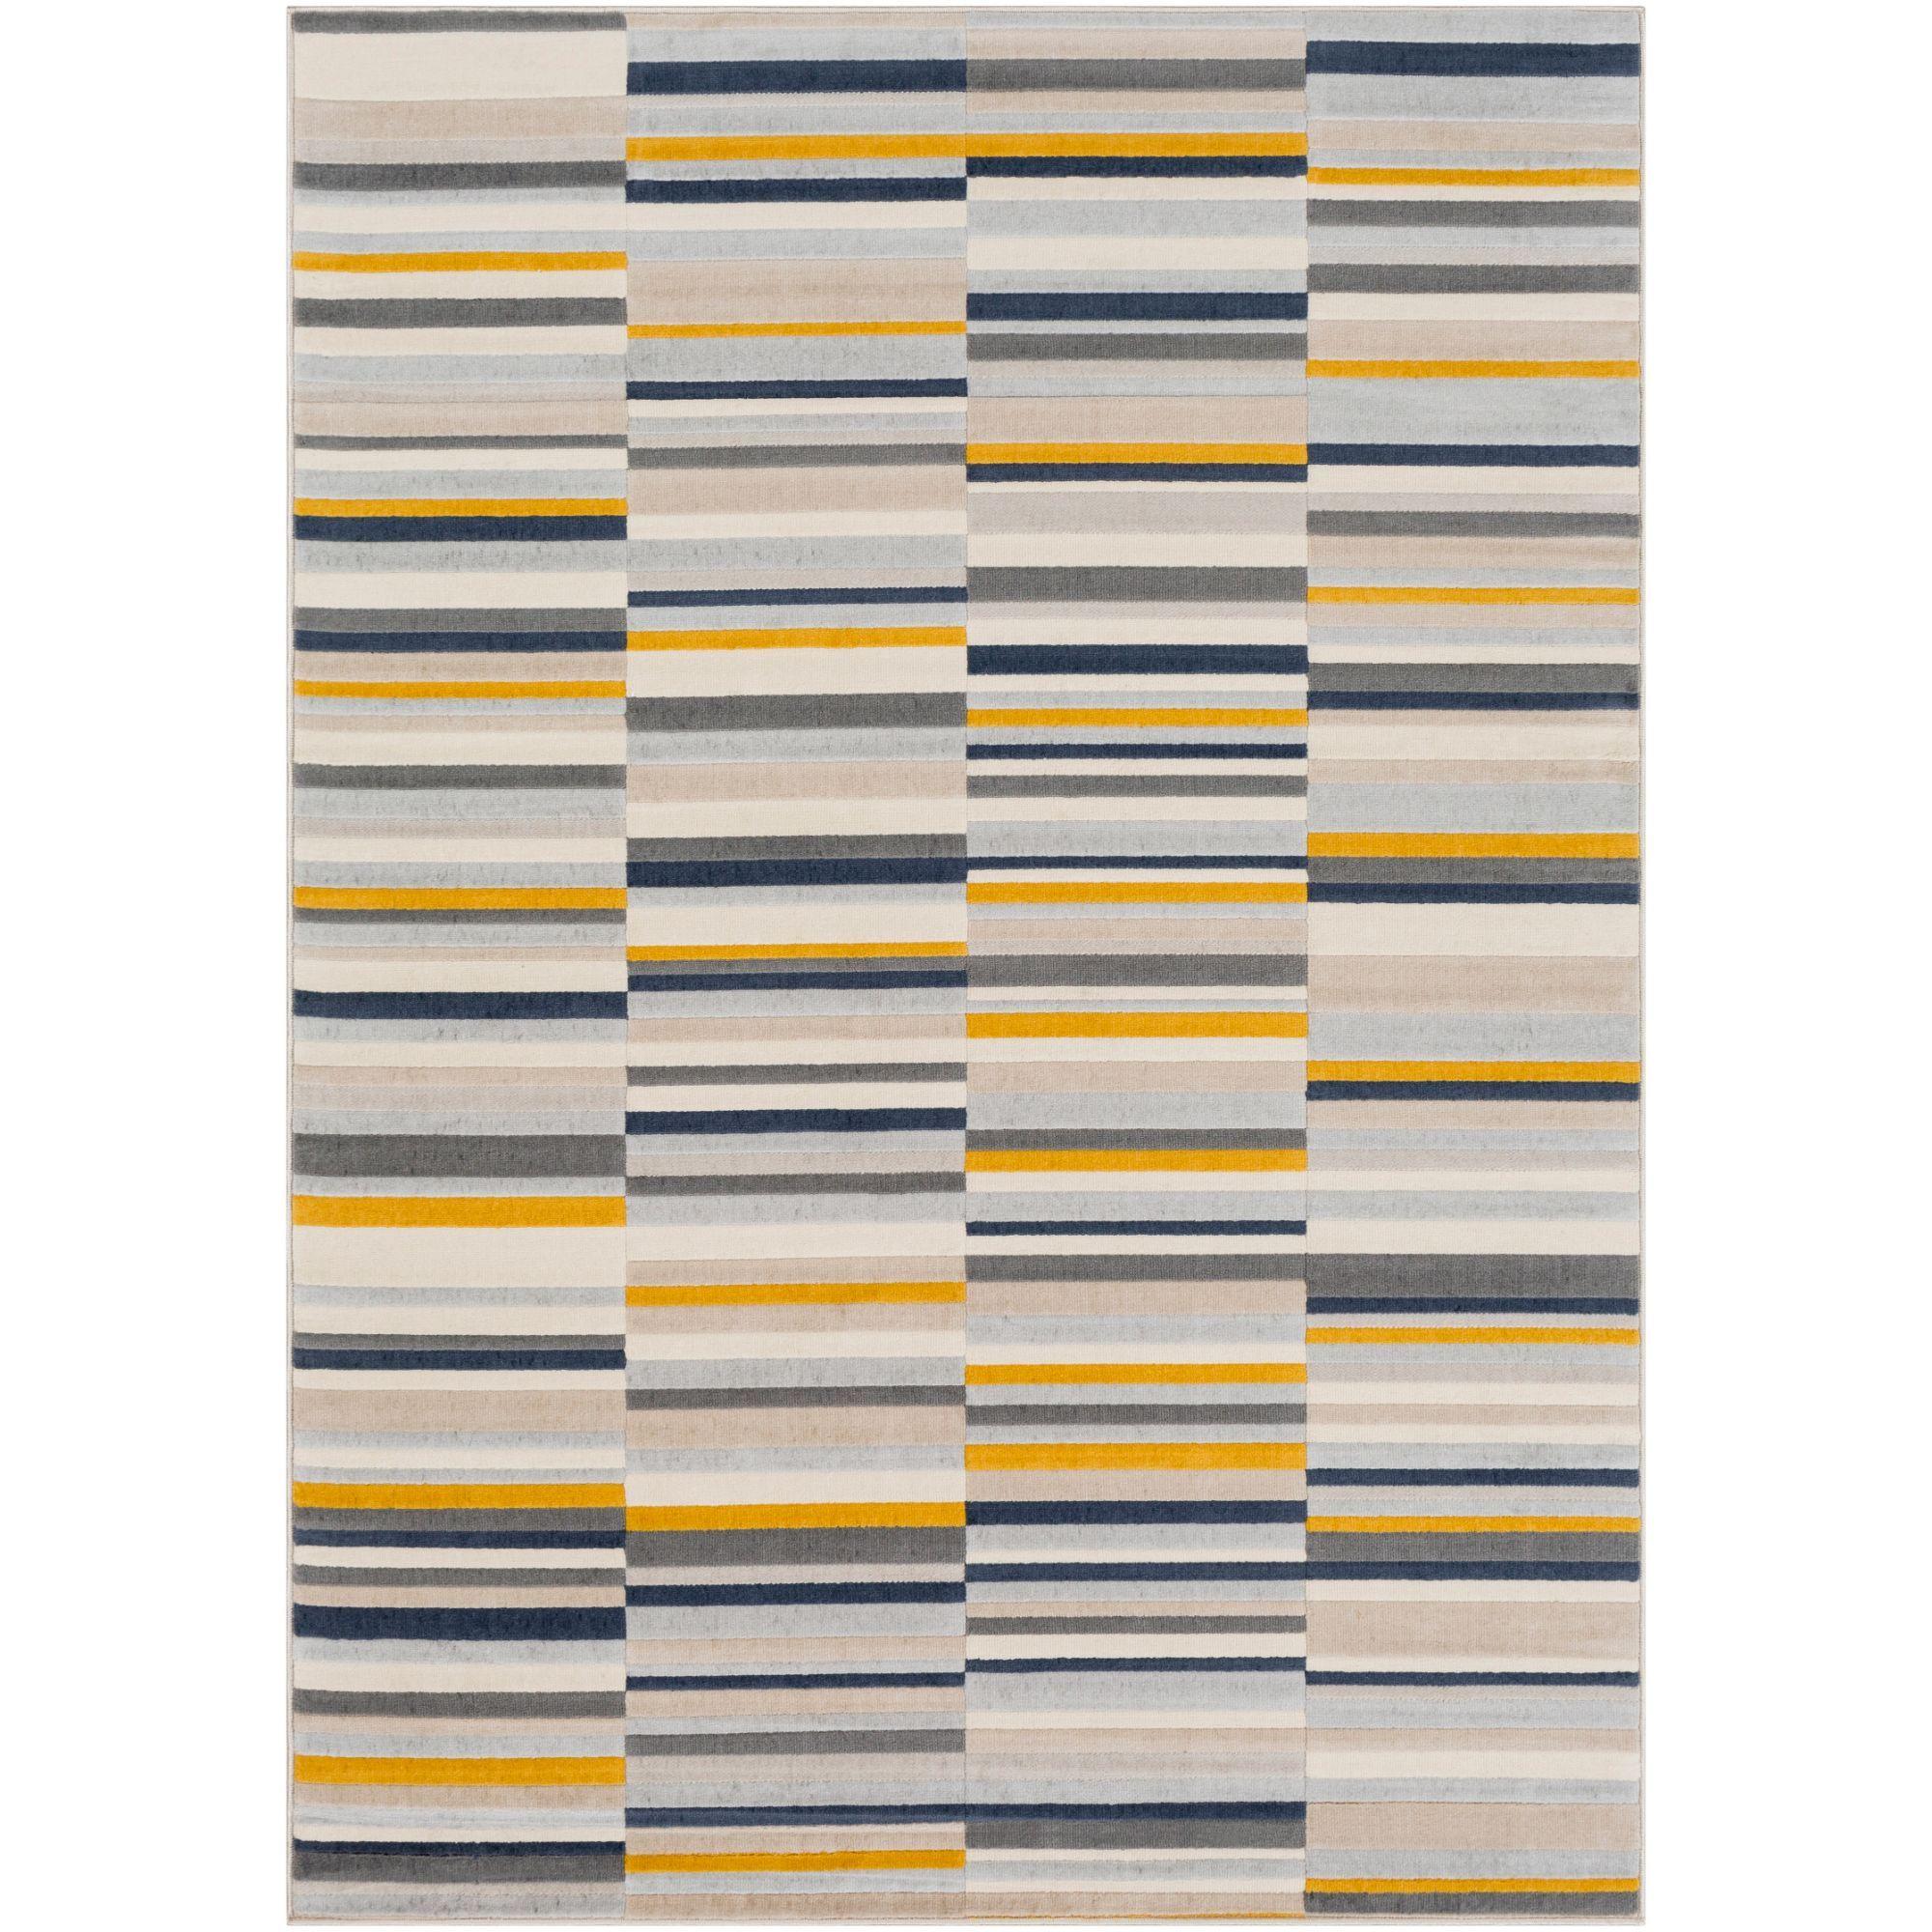 7 8 X 10 25 Geometric Patterned Mustard Yellow And Gray